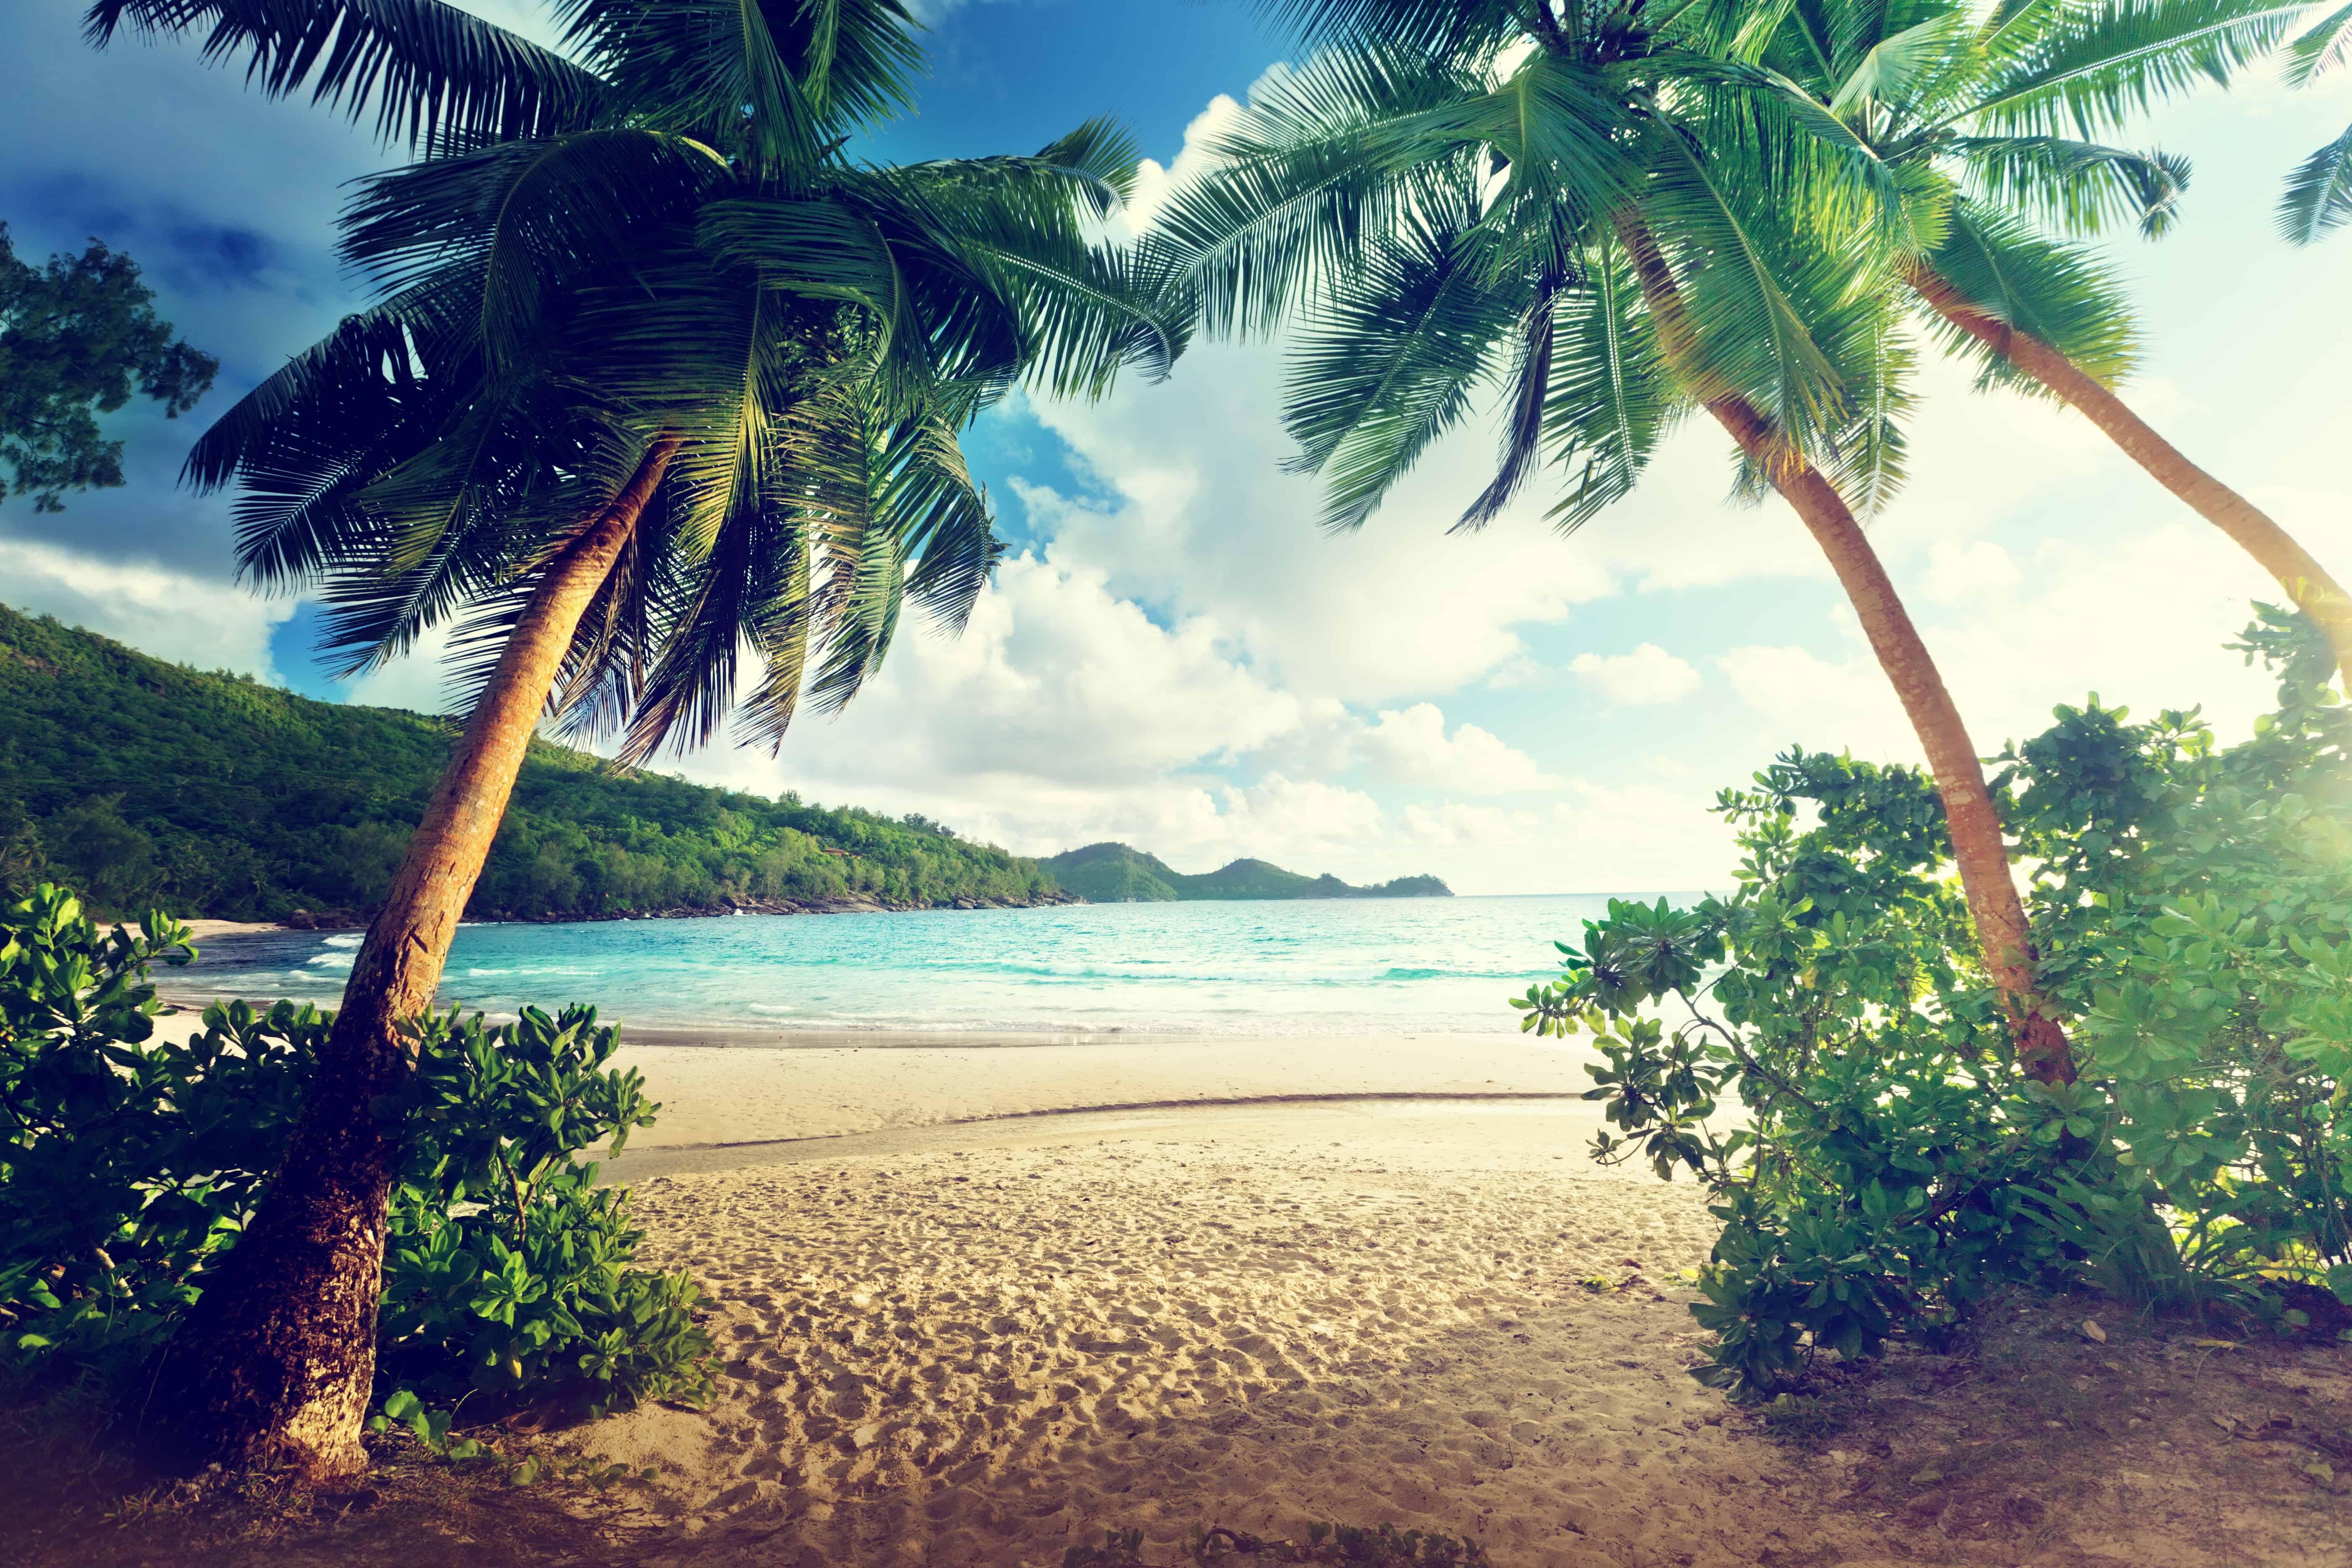 Seychelles, Africa best vacation spots